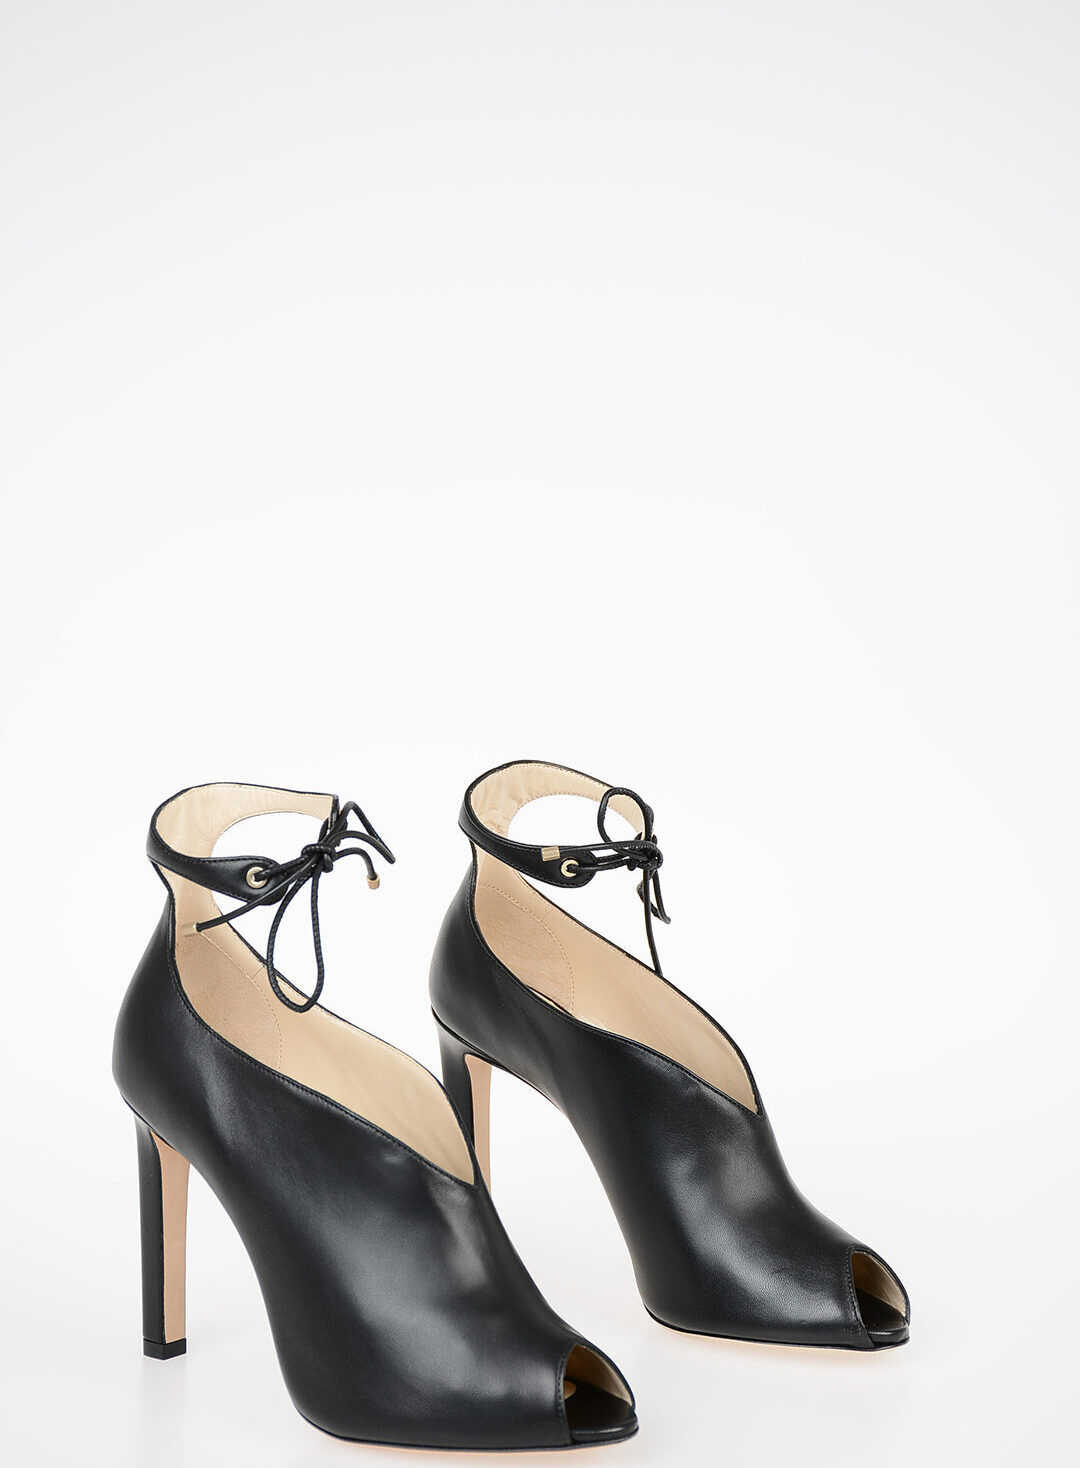 10cm Leather SAYRA Pumps thumbnail